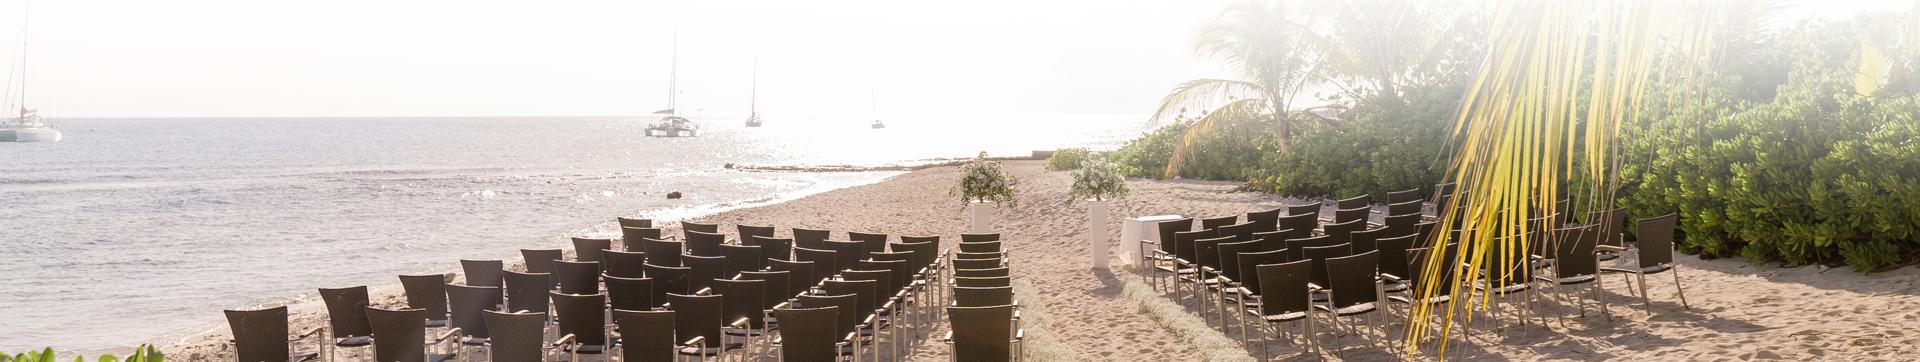 Wedding Gallery Banner - The Wharf Restaurant & Bar